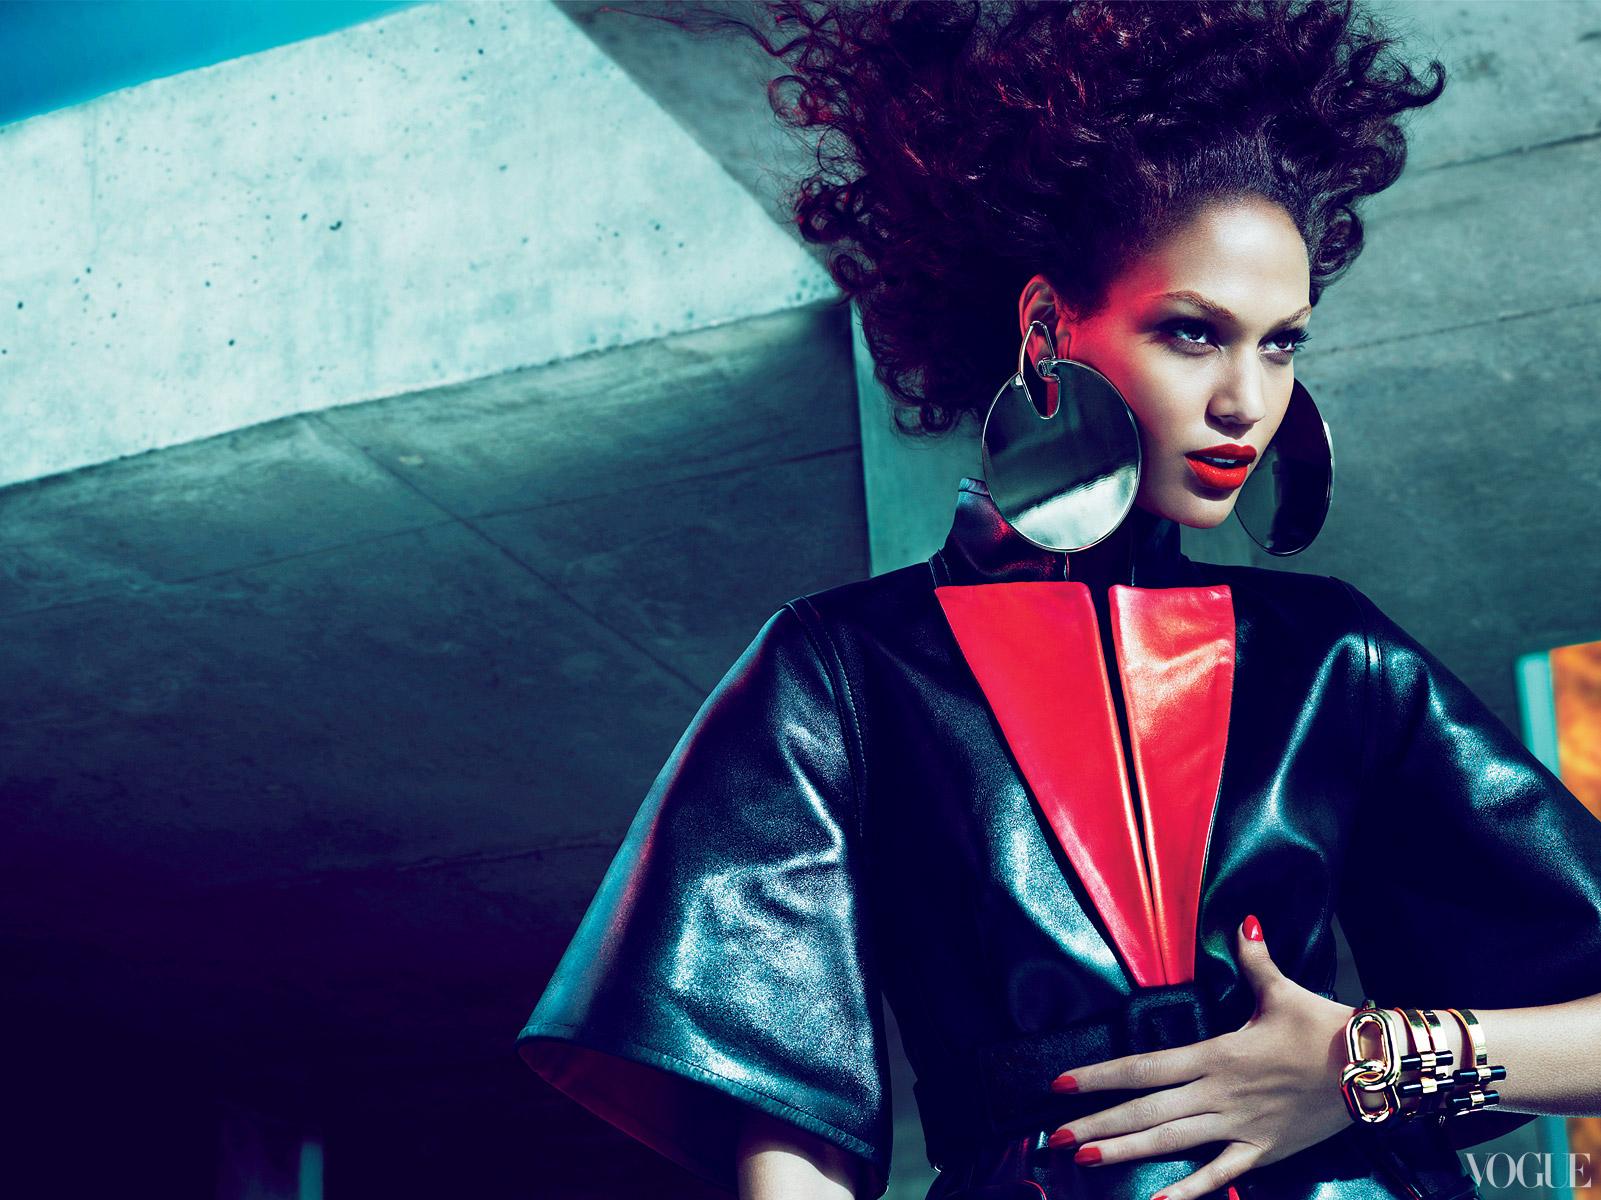 Joan Smalls Mert Alas Marcus Piggott Photoshoot 2012 for Vogue 02.jpg